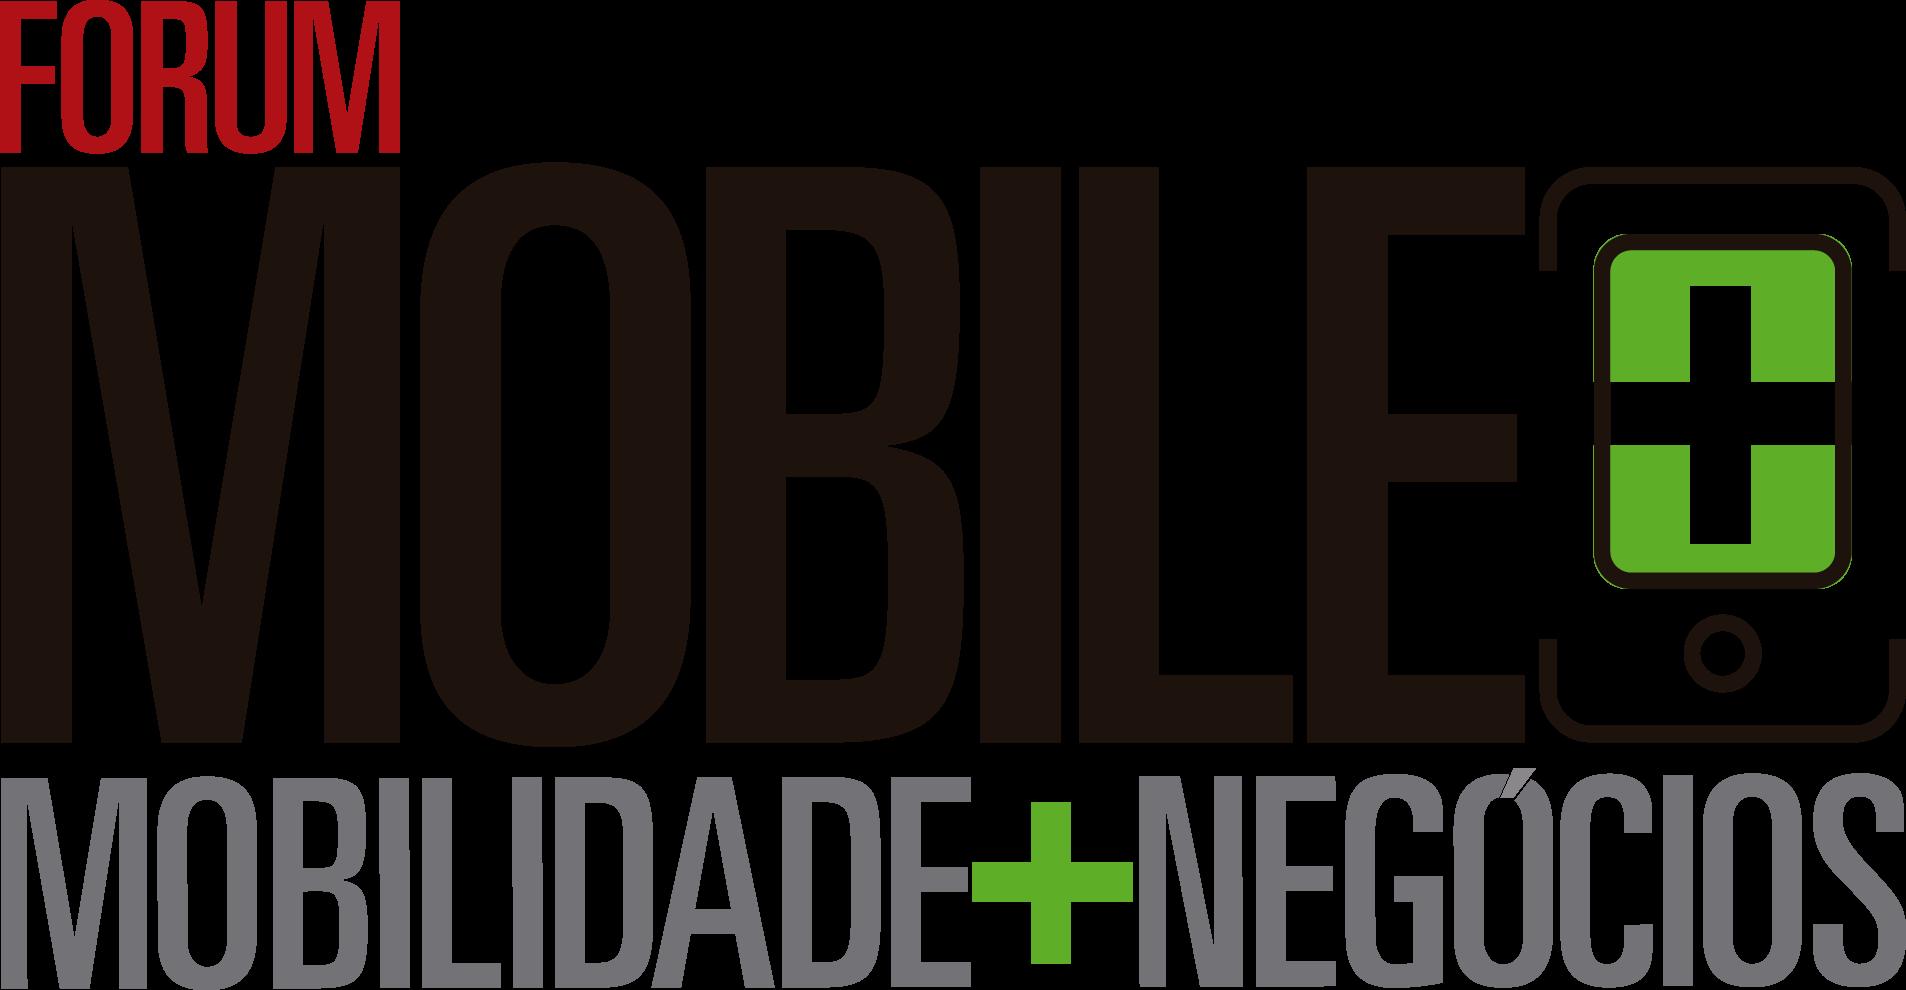 Forum Mobile+